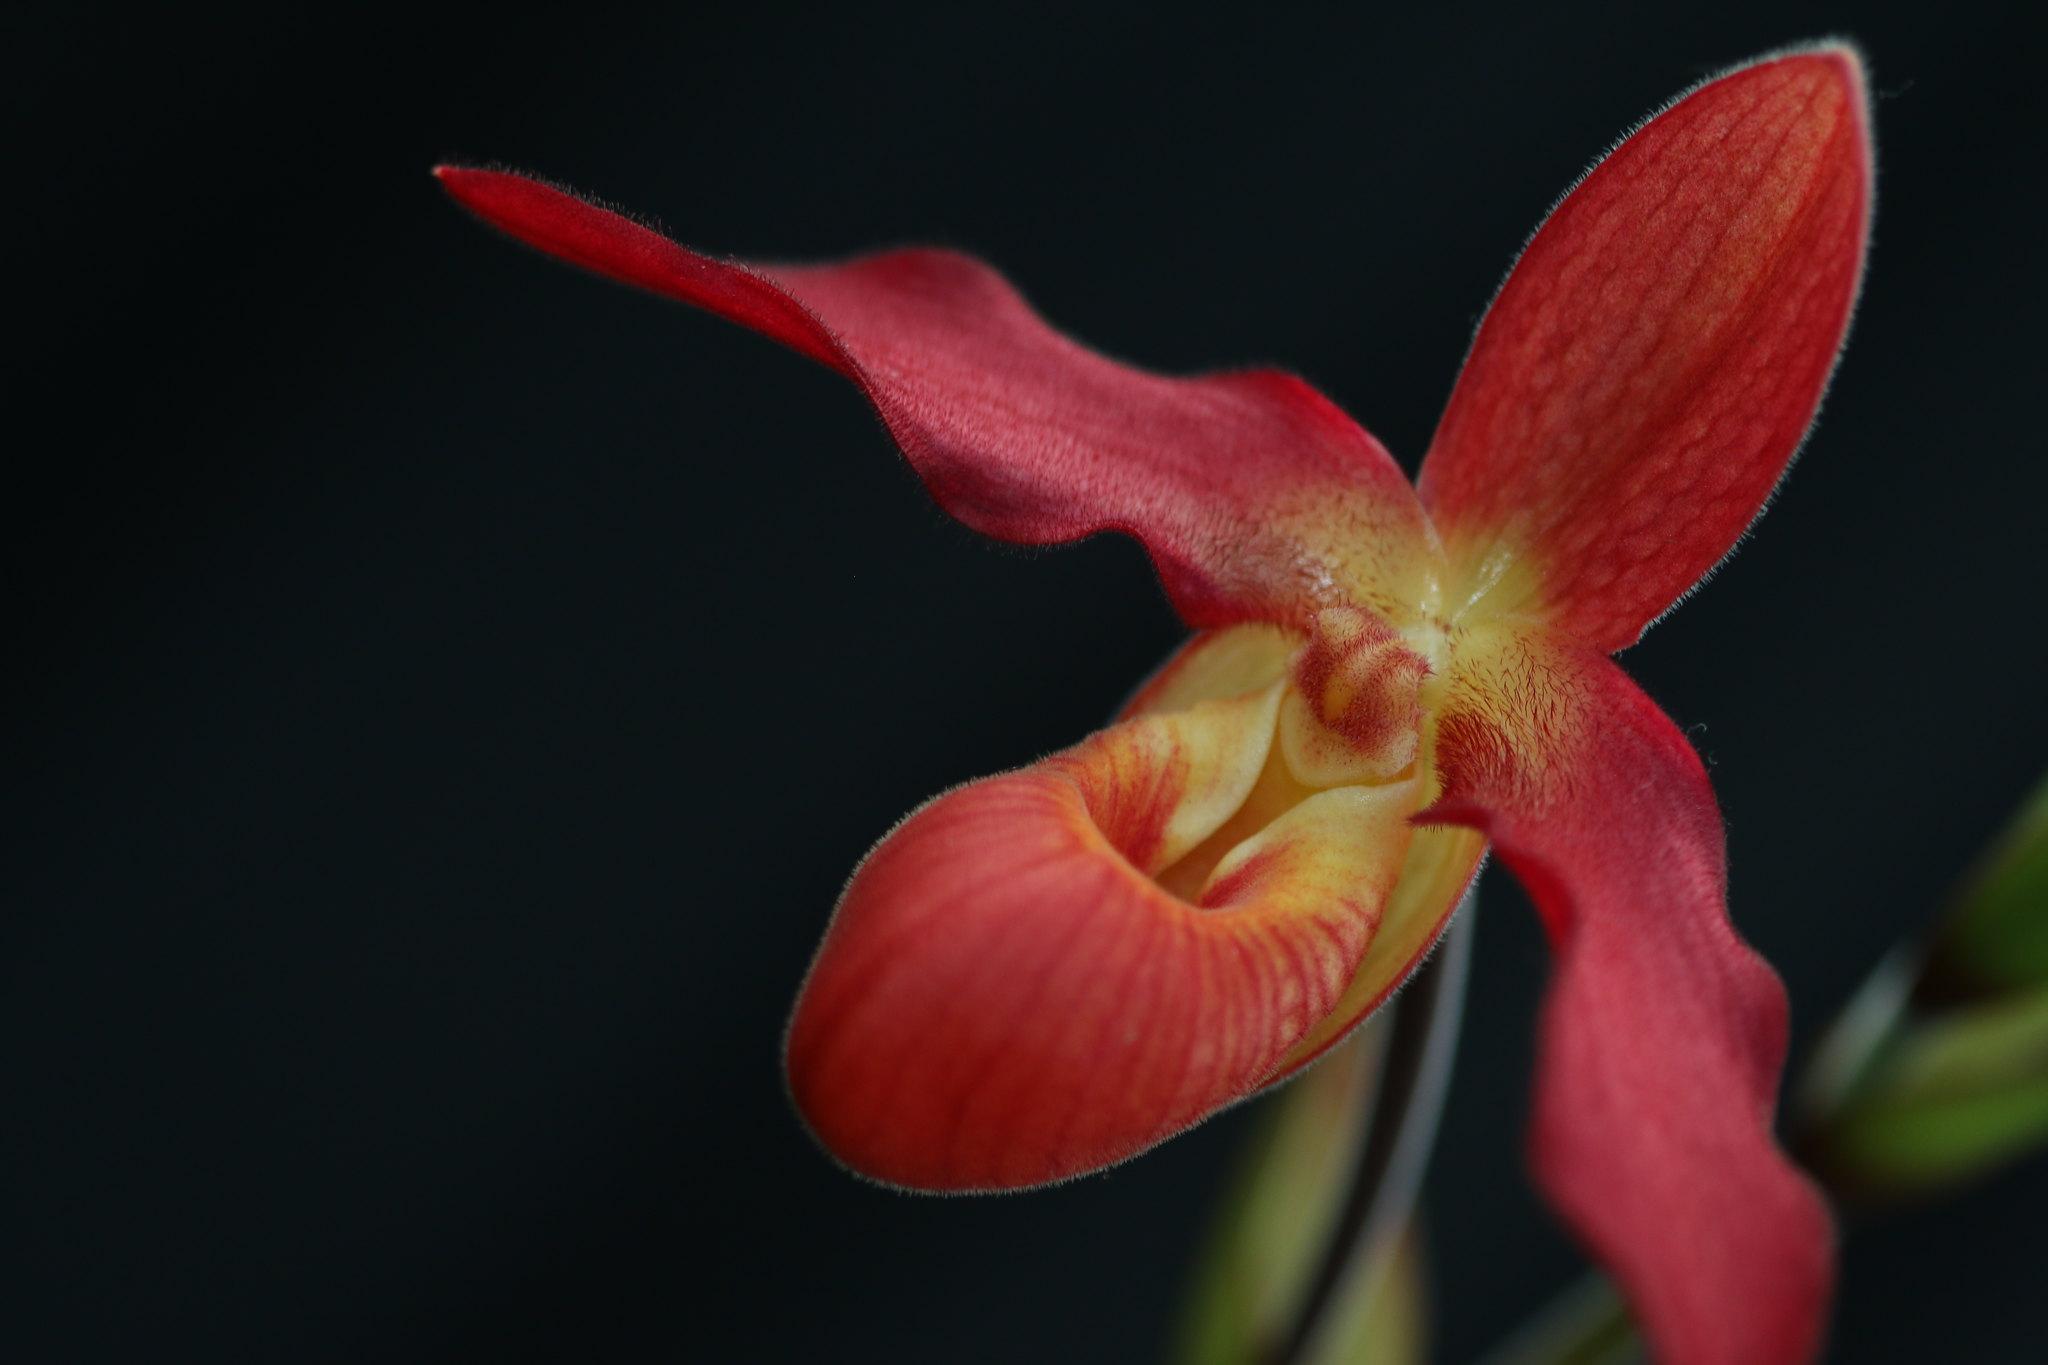 Red Slipper, Of Sorts (SOTC 319/365)